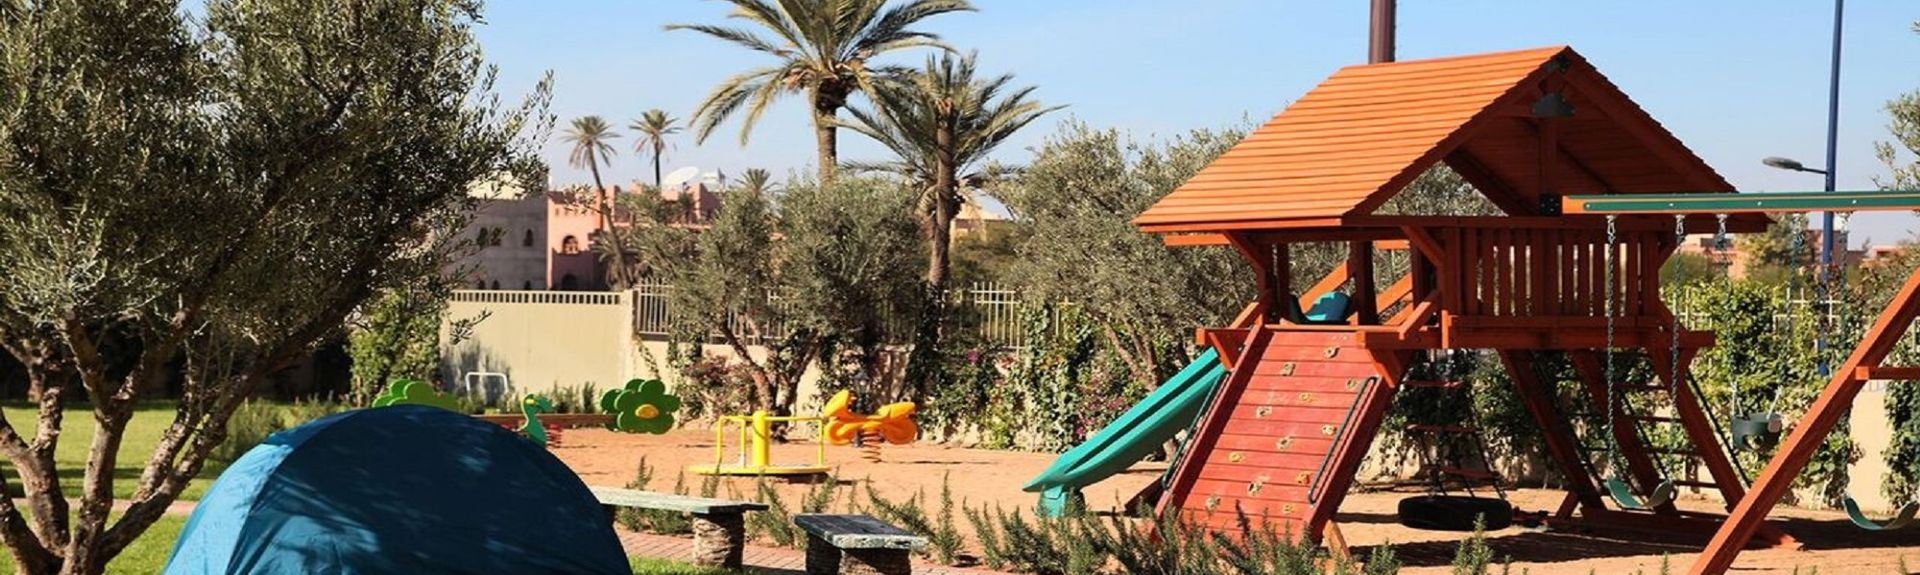 Bab Doukkala, Marrakech, Marrakesh-Safi, Marokko